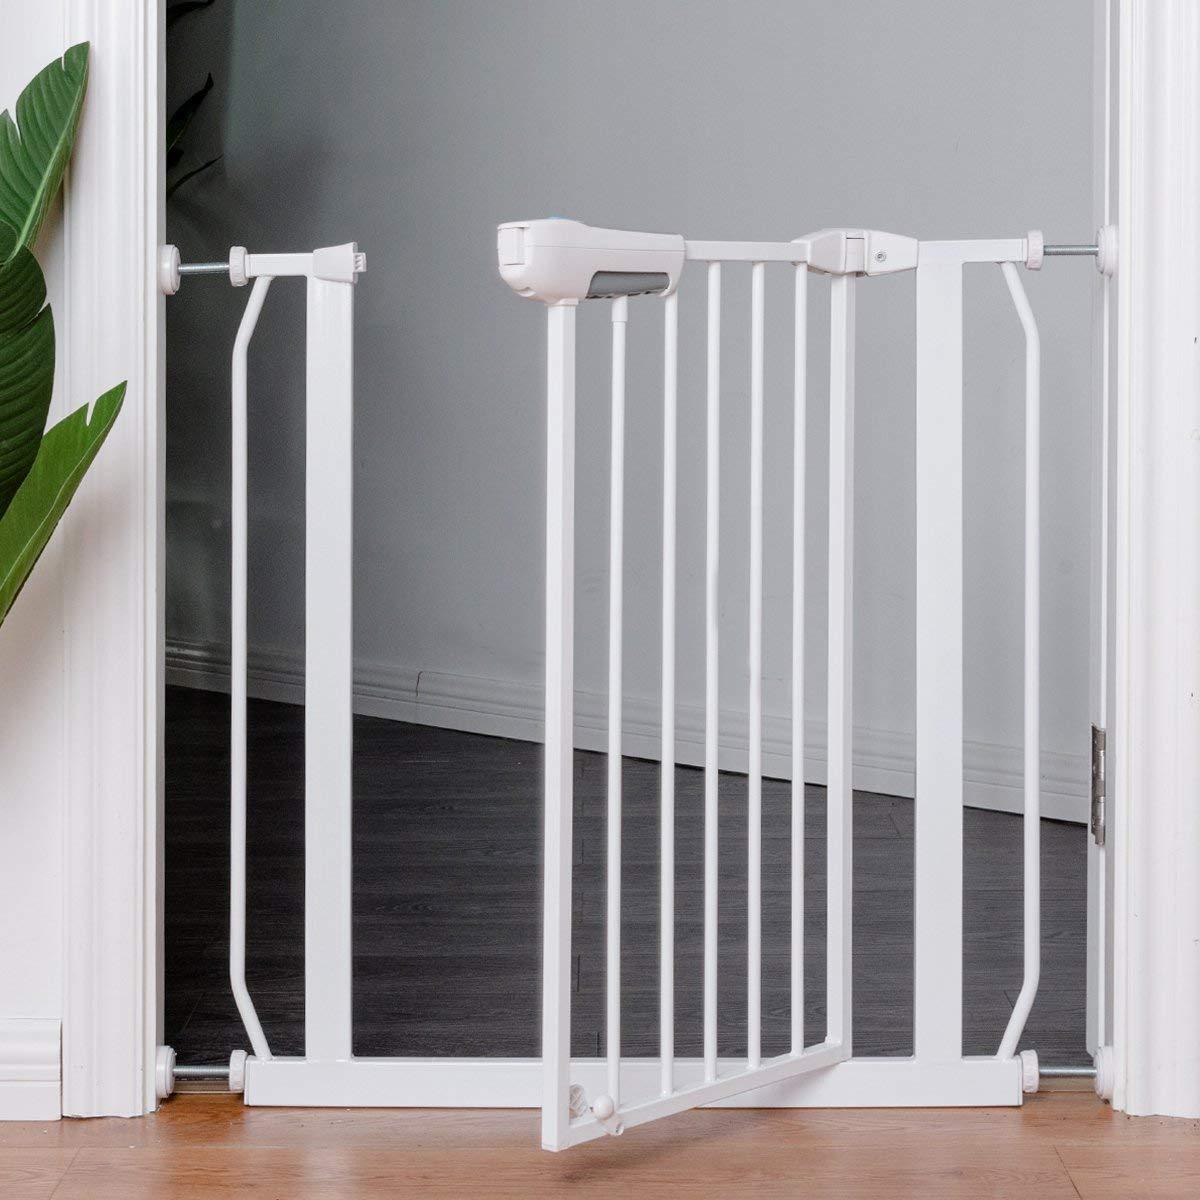 White Easy Close Walk Through Gate Costzon Baby Safety Gate